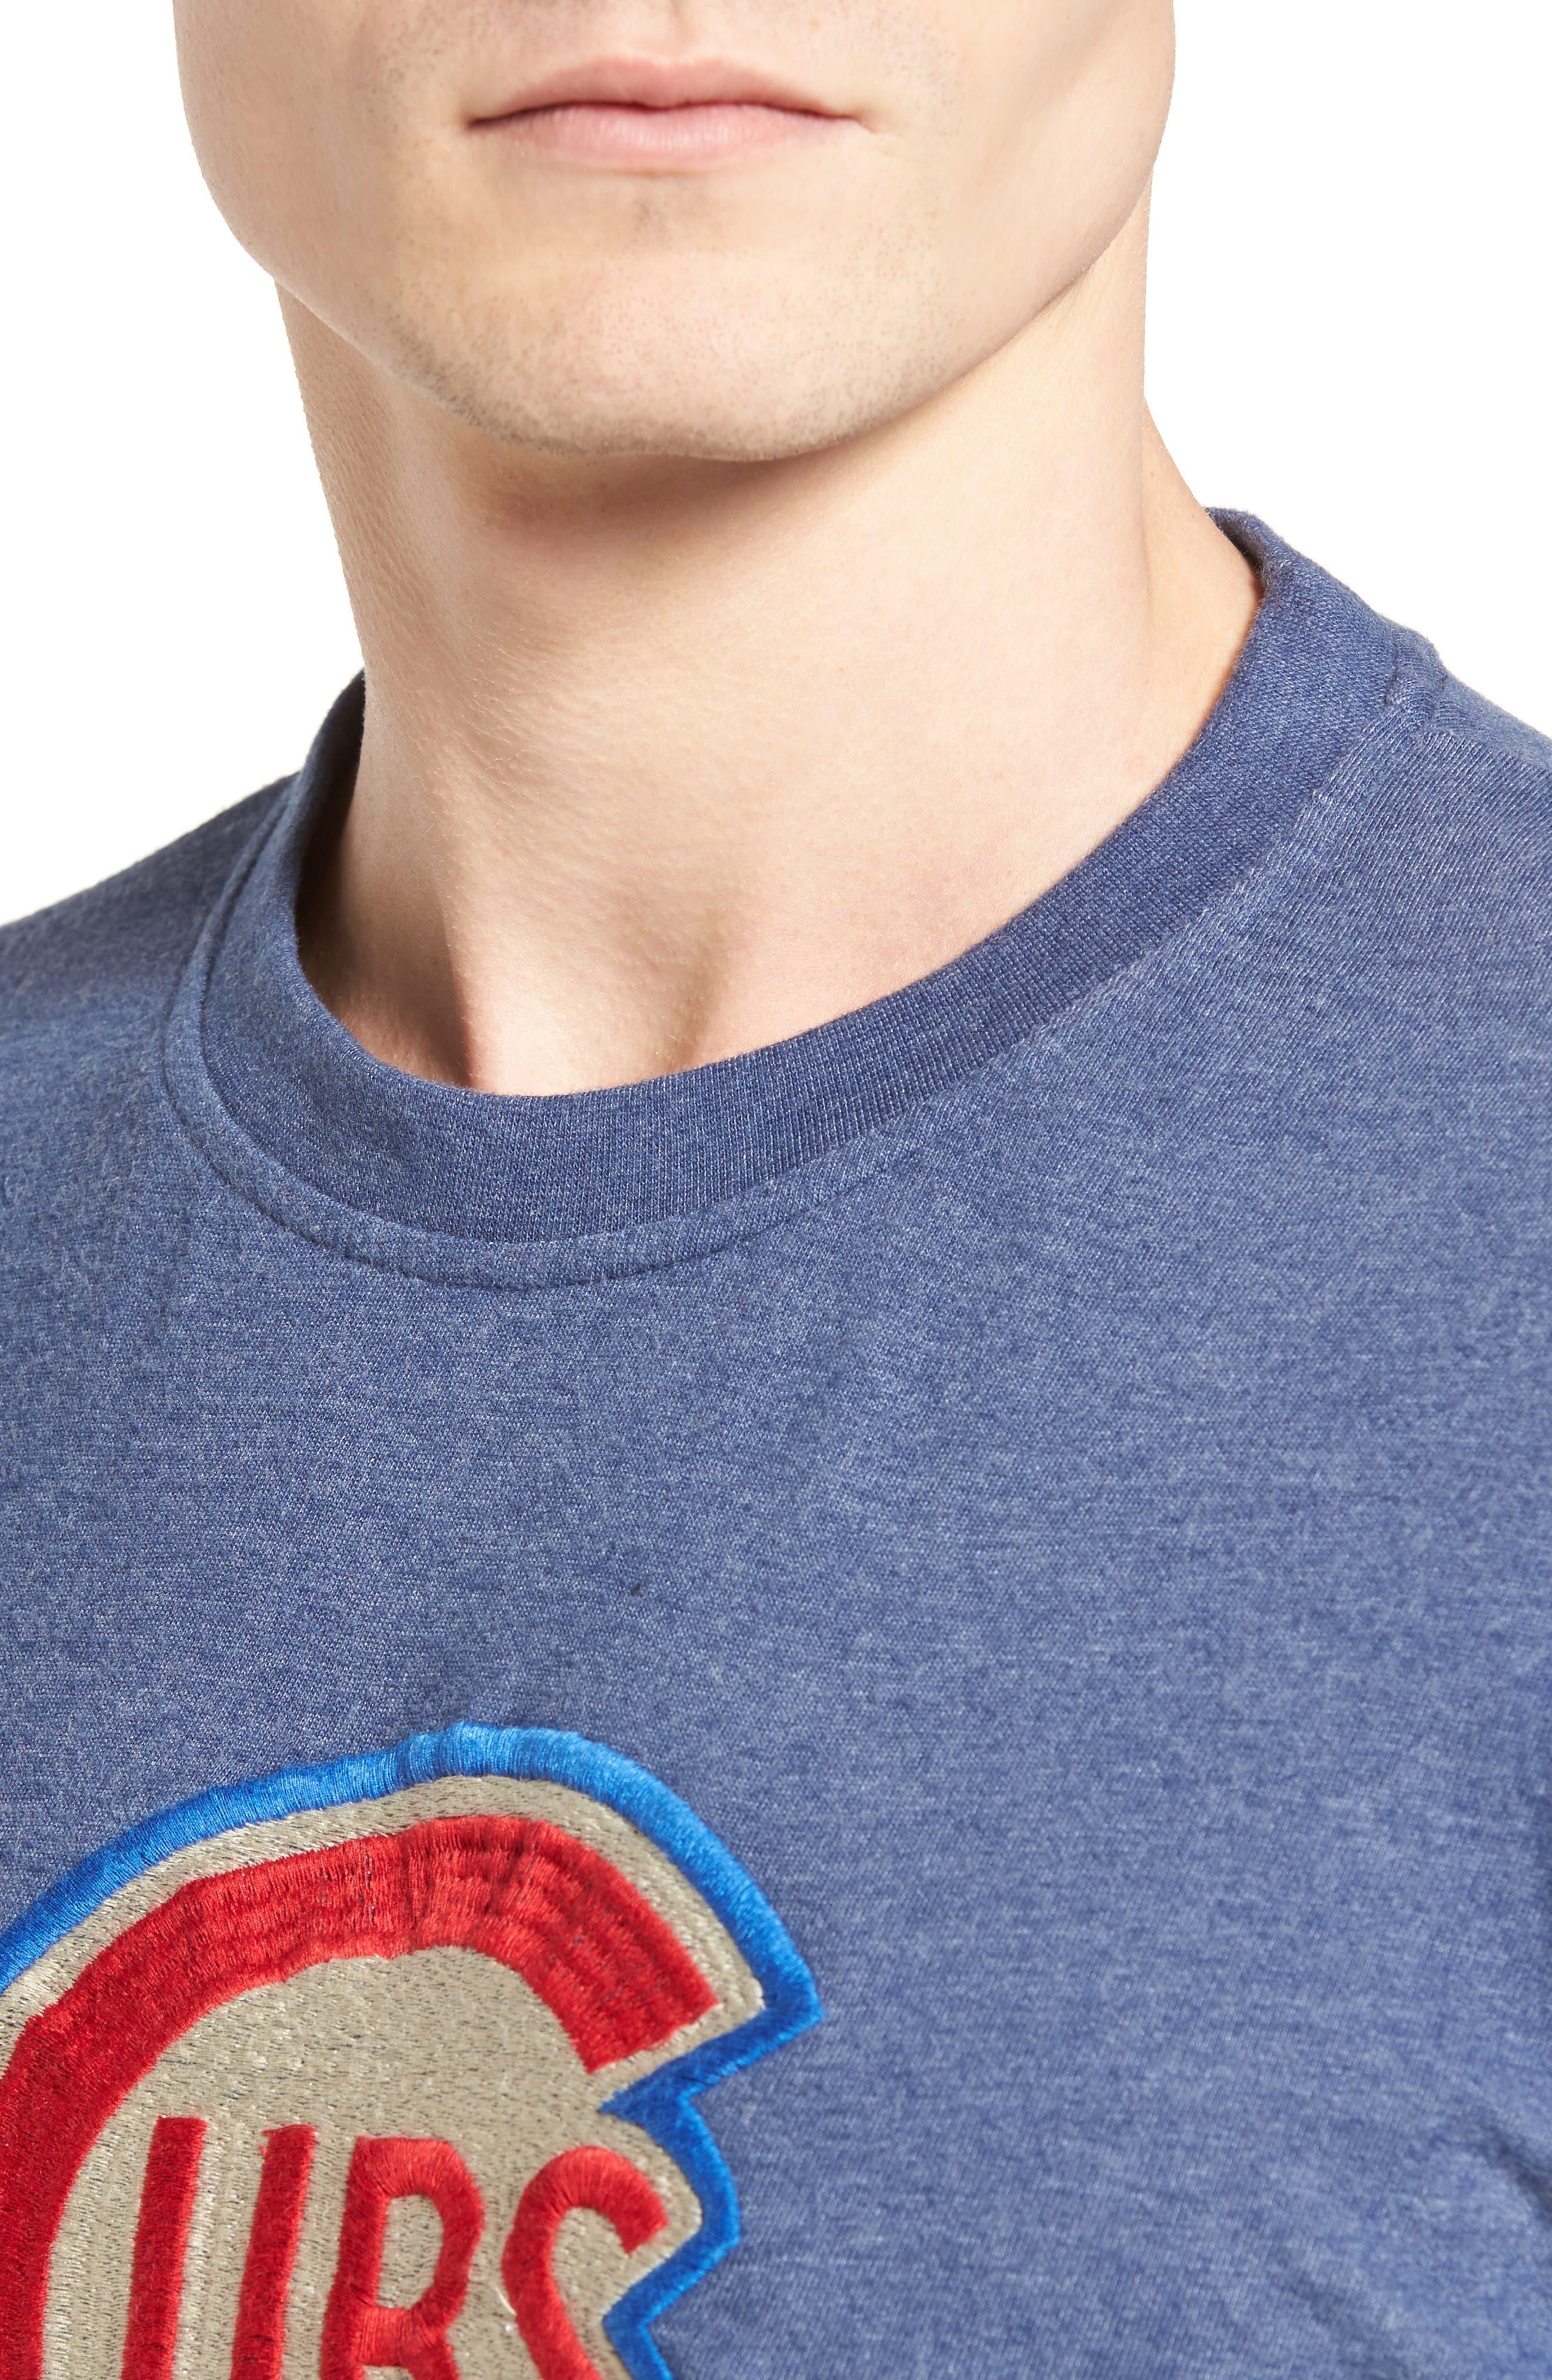 Hillwood Chicago Cubs T-Shirt,                             Alternate thumbnail 4, color,                             422